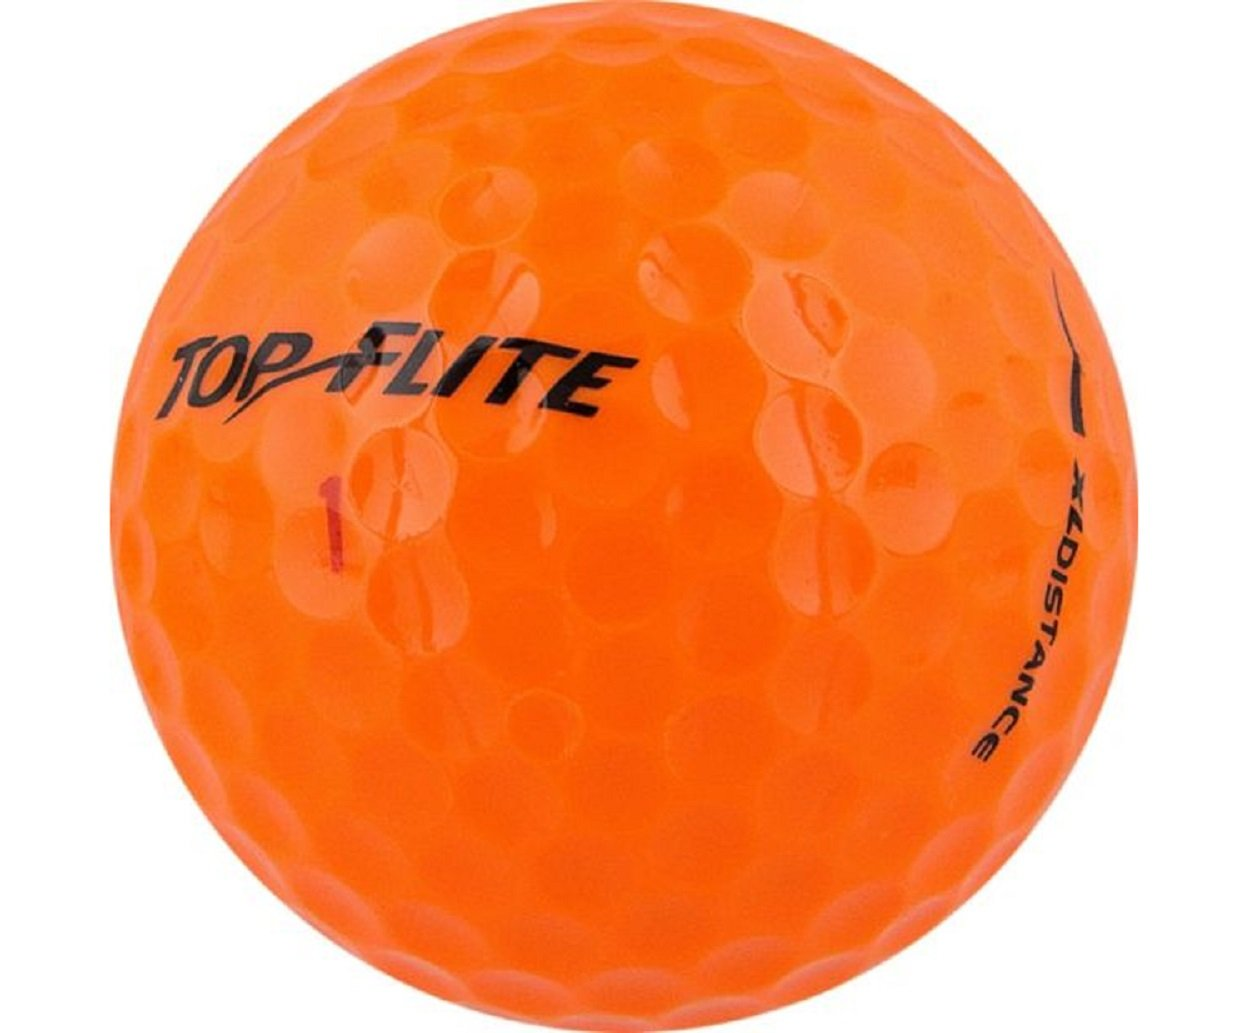 2pk Top Flite XL Distance Golf Balls - Orange - 36 Balls by Top Flight (Image #2)